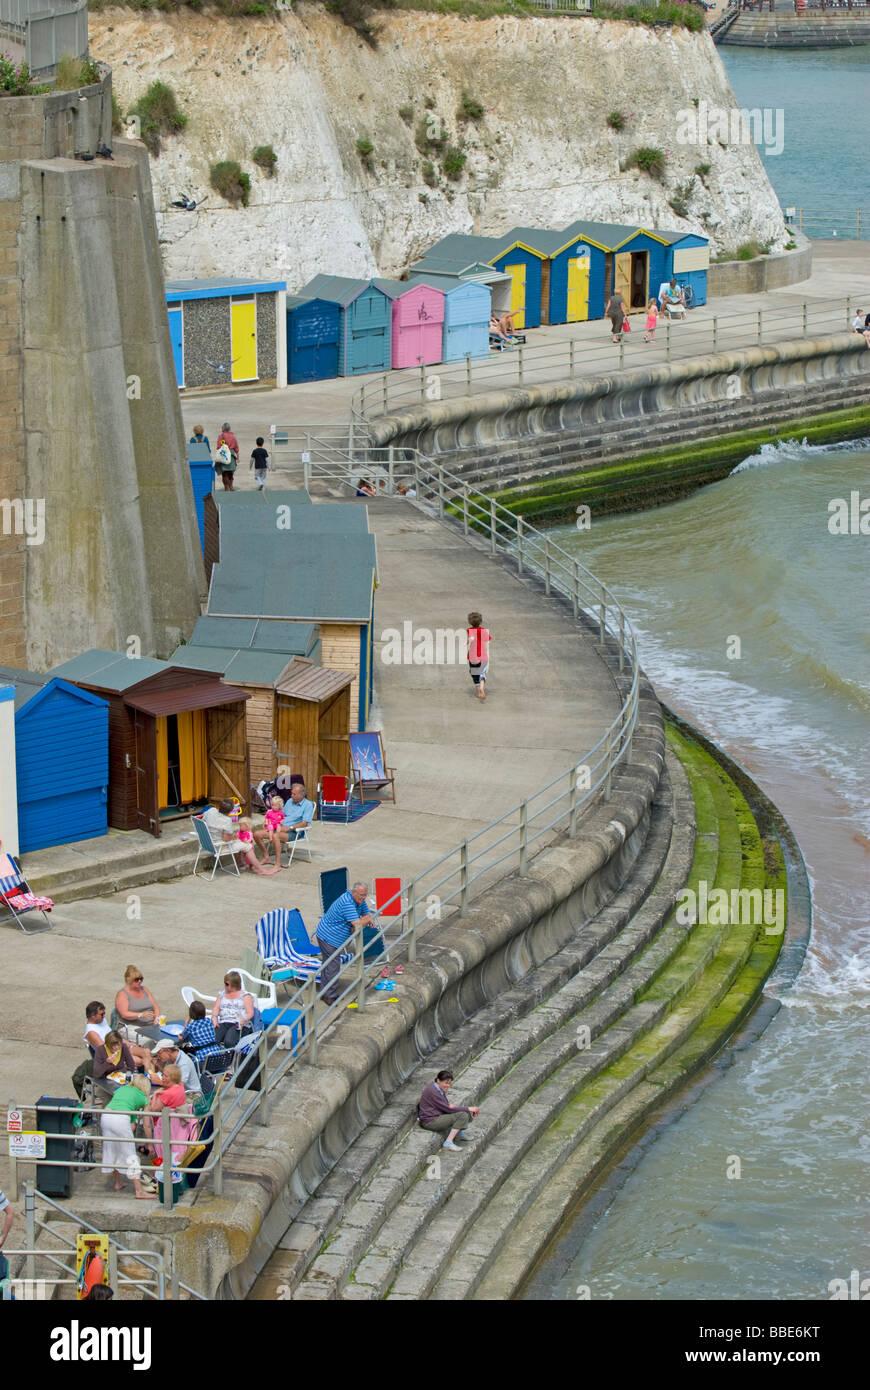 Broadstairs, Kent, England, UK. Louisa Bay. Families and beach huts - Stock Image